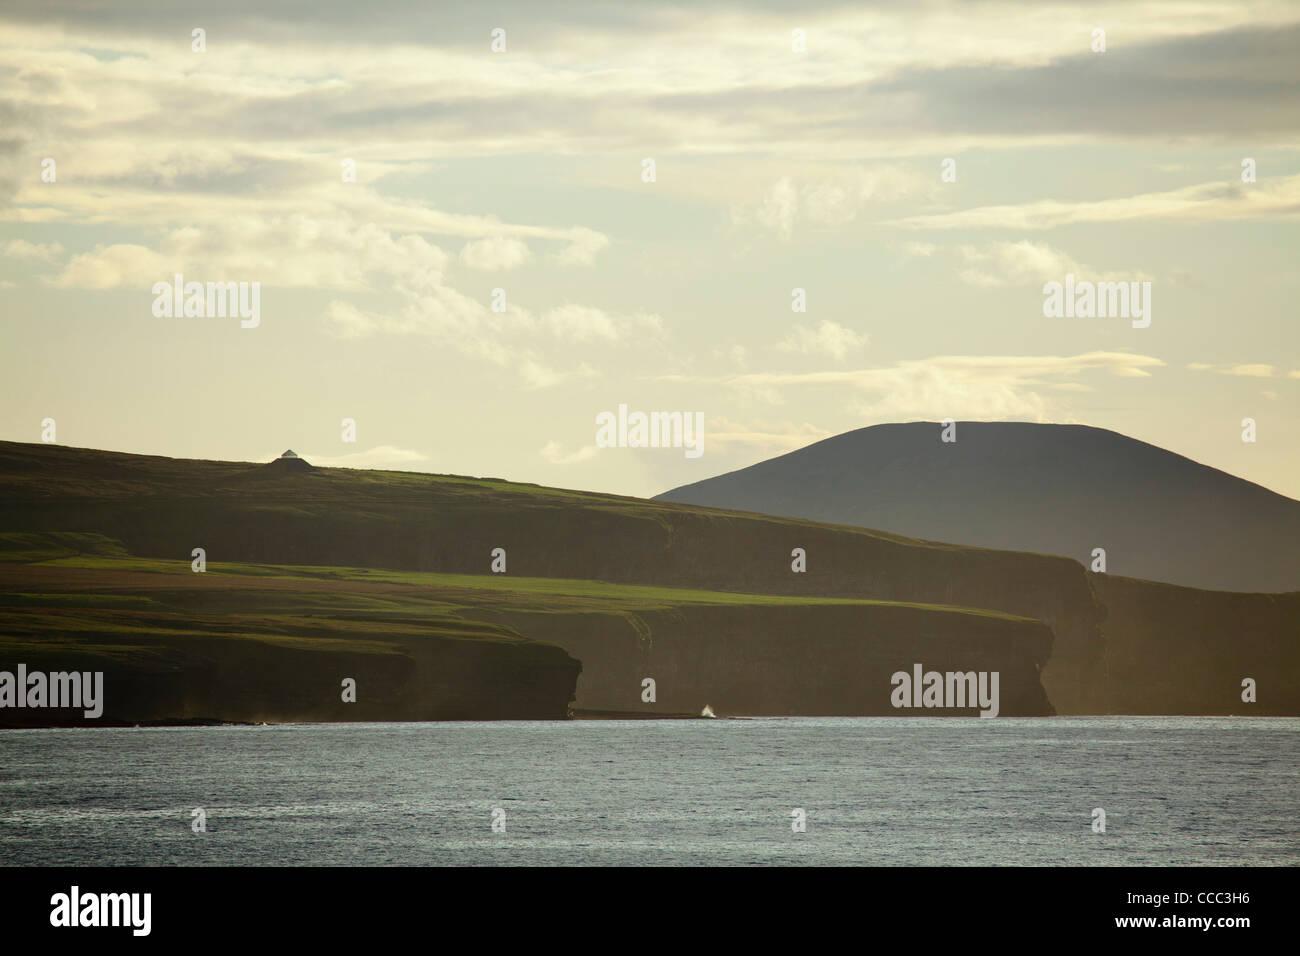 The Ceide Fields and North Mayo Seacliffs seem from Downpatrick Head, County Mayo, Ireland. - Stock Image